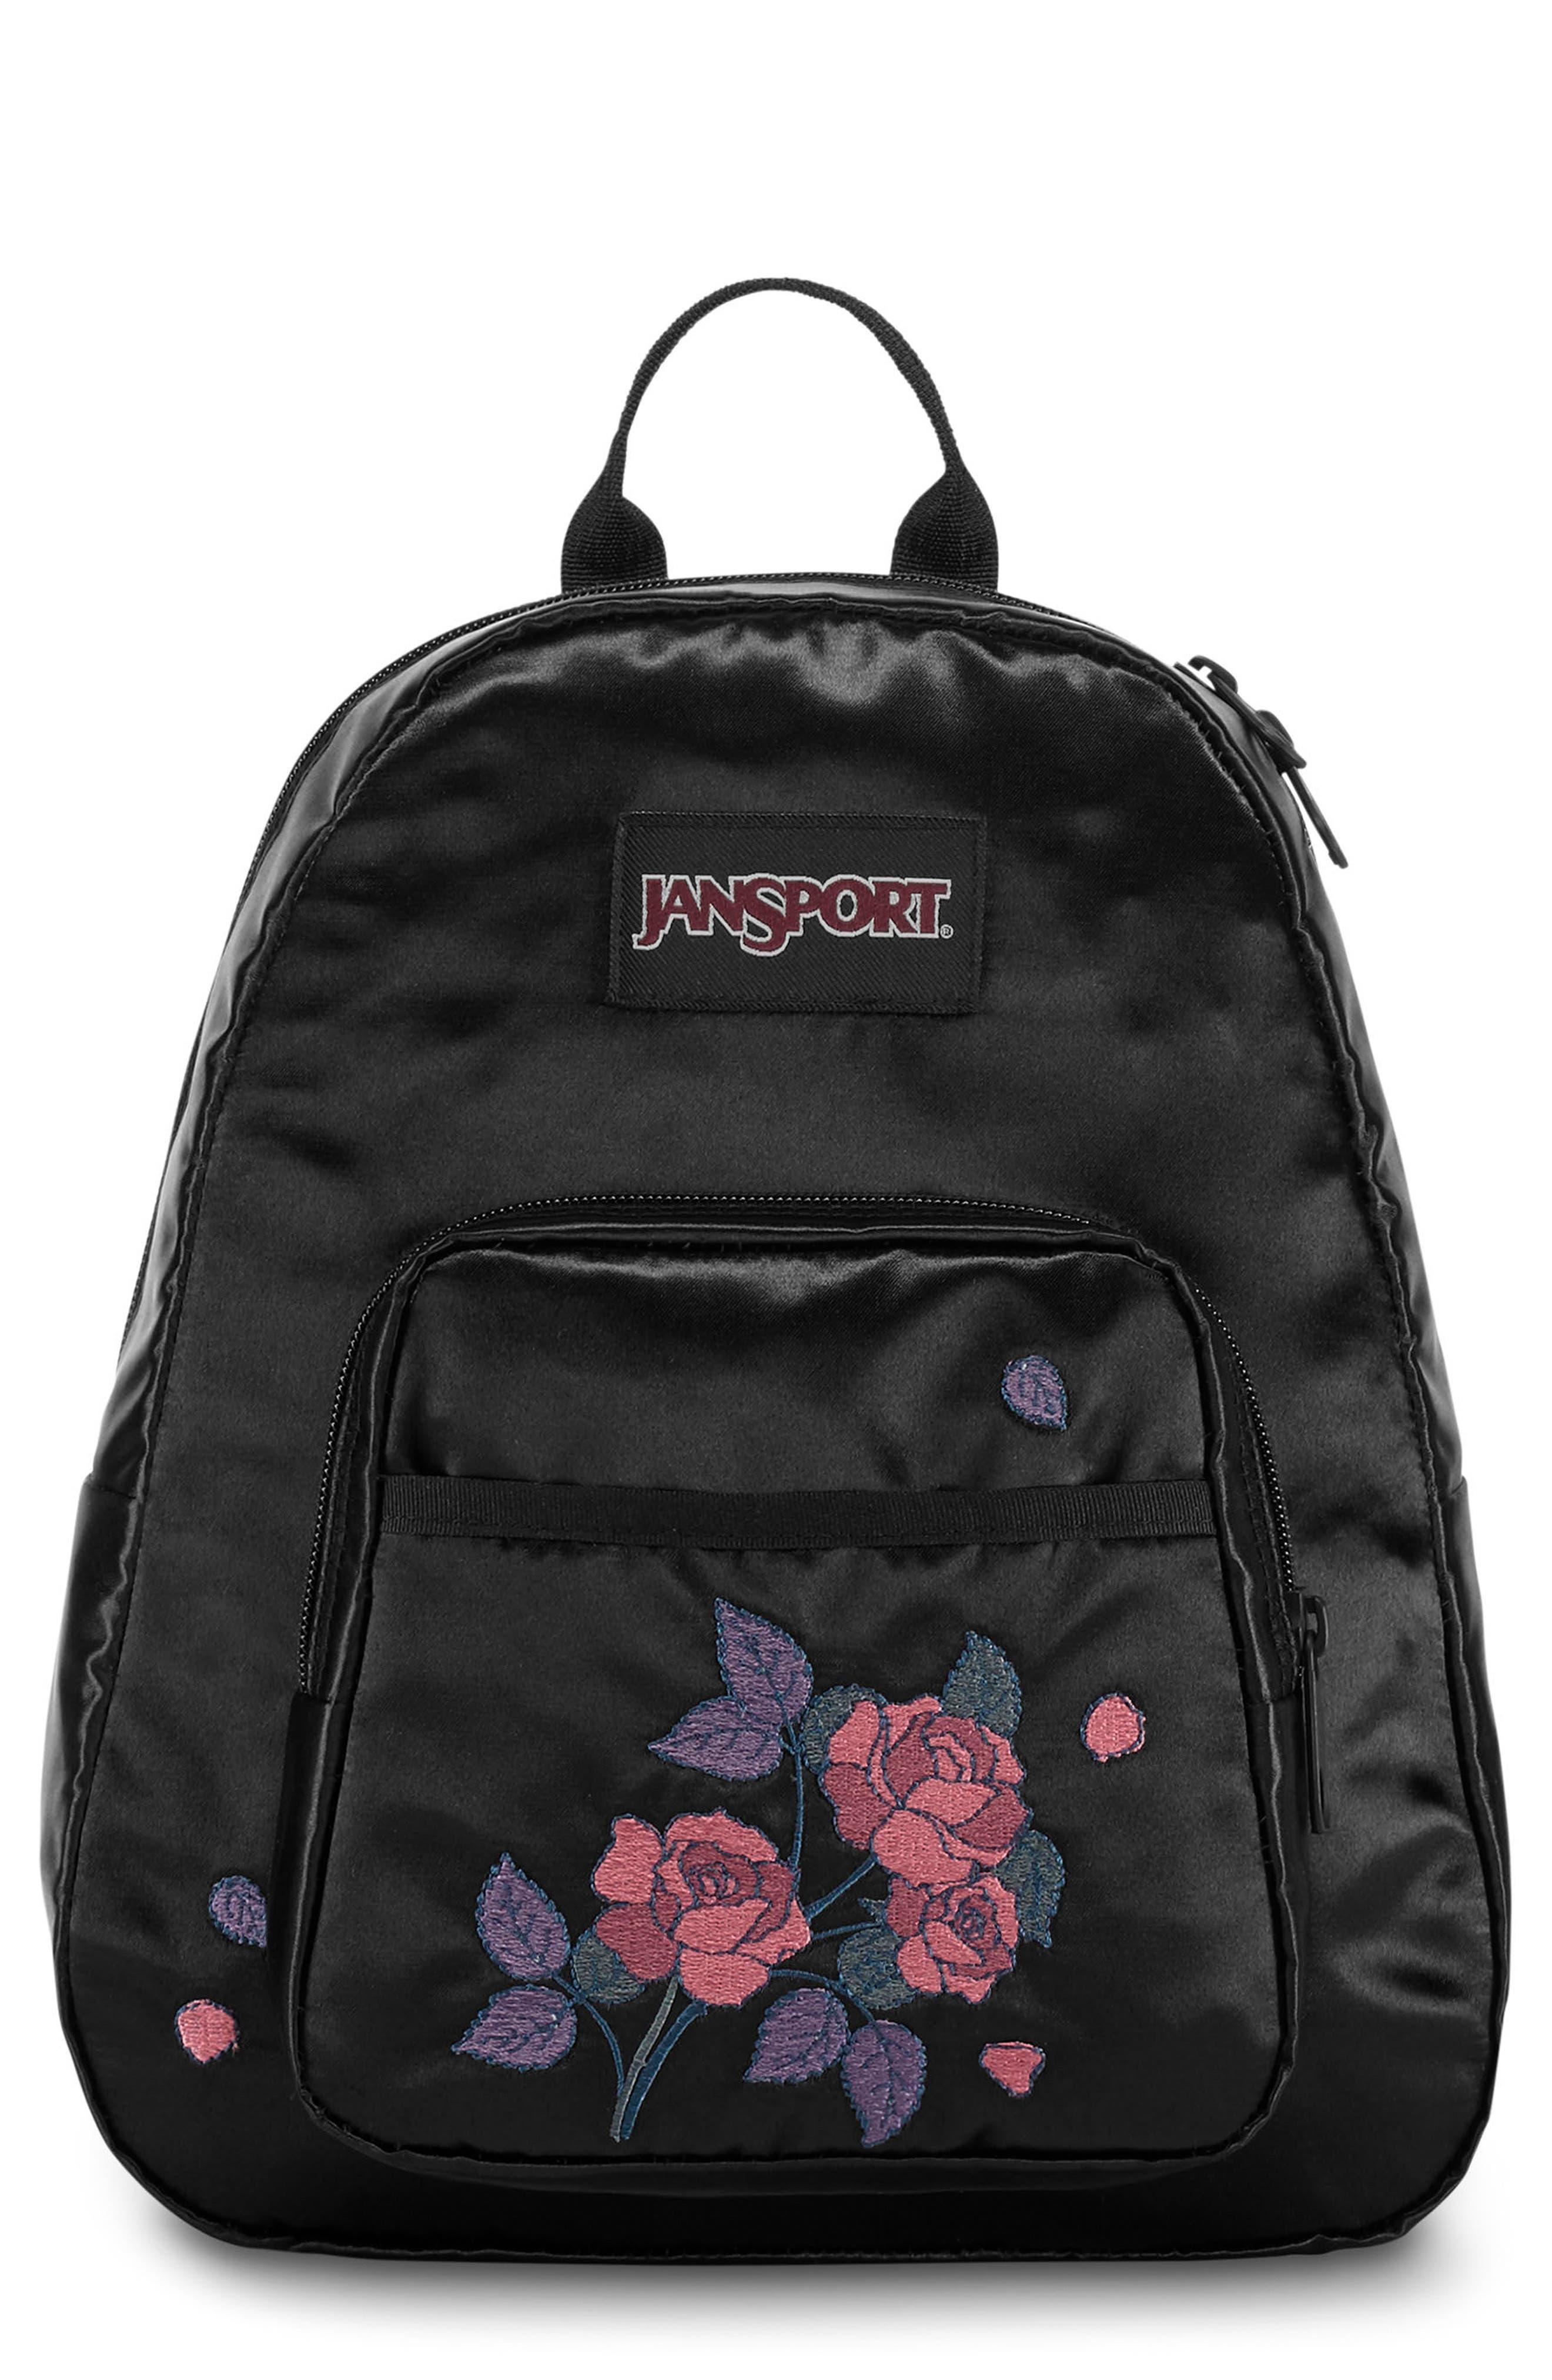 Half Pint FX Backpack,                         Main,                         color, SATIN ROSE